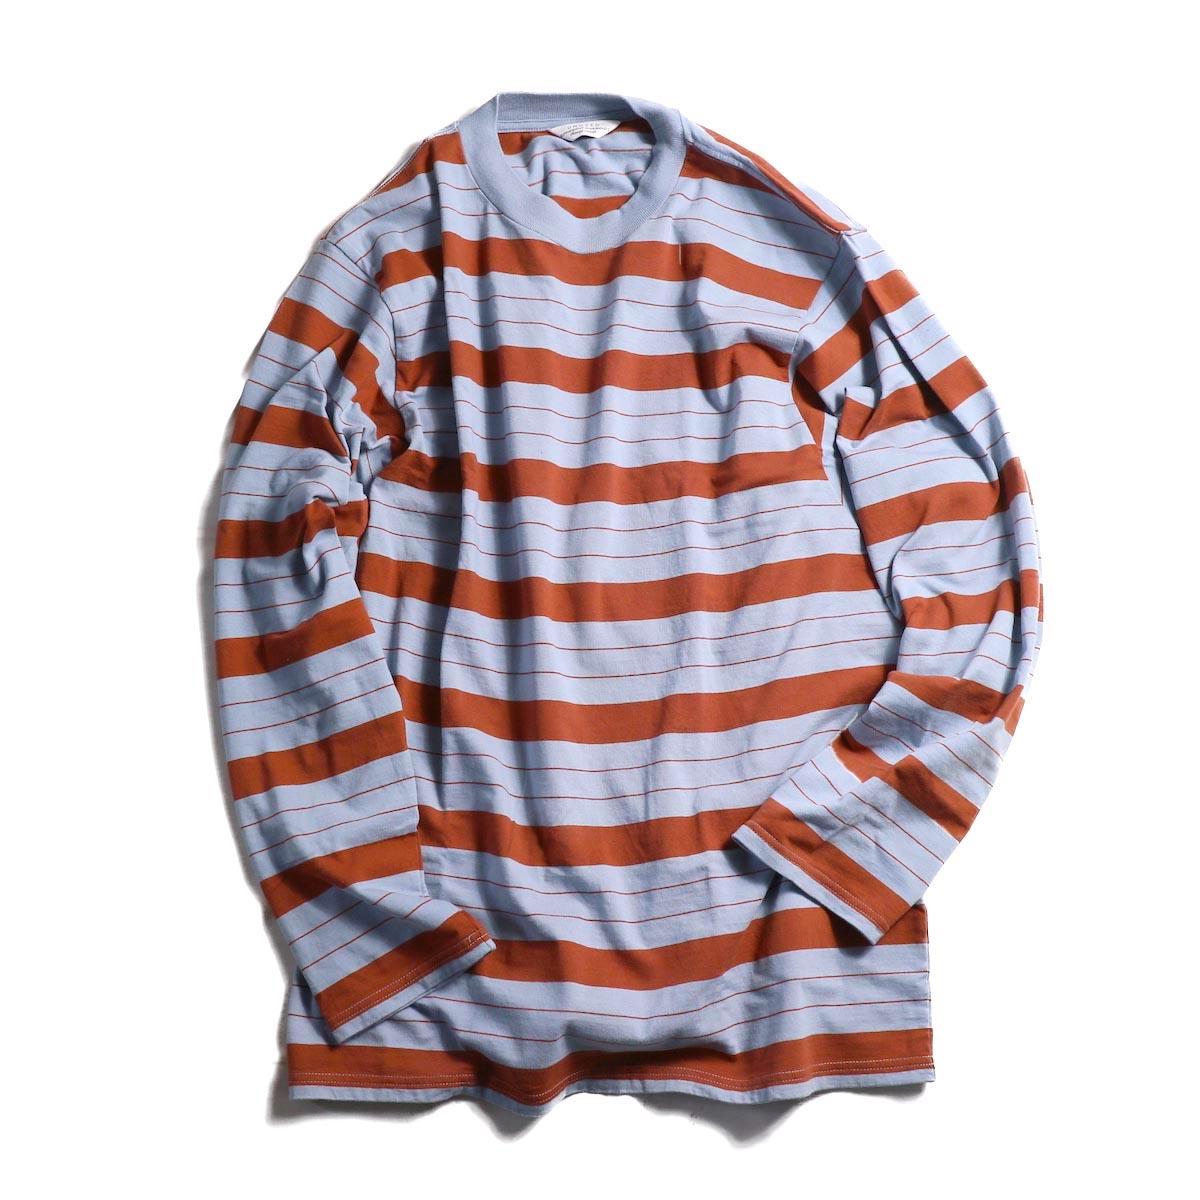 UNUSED / US1513 Long Sleeve Border T-shirt. -GRAY BLUE × LIGHT BROWN